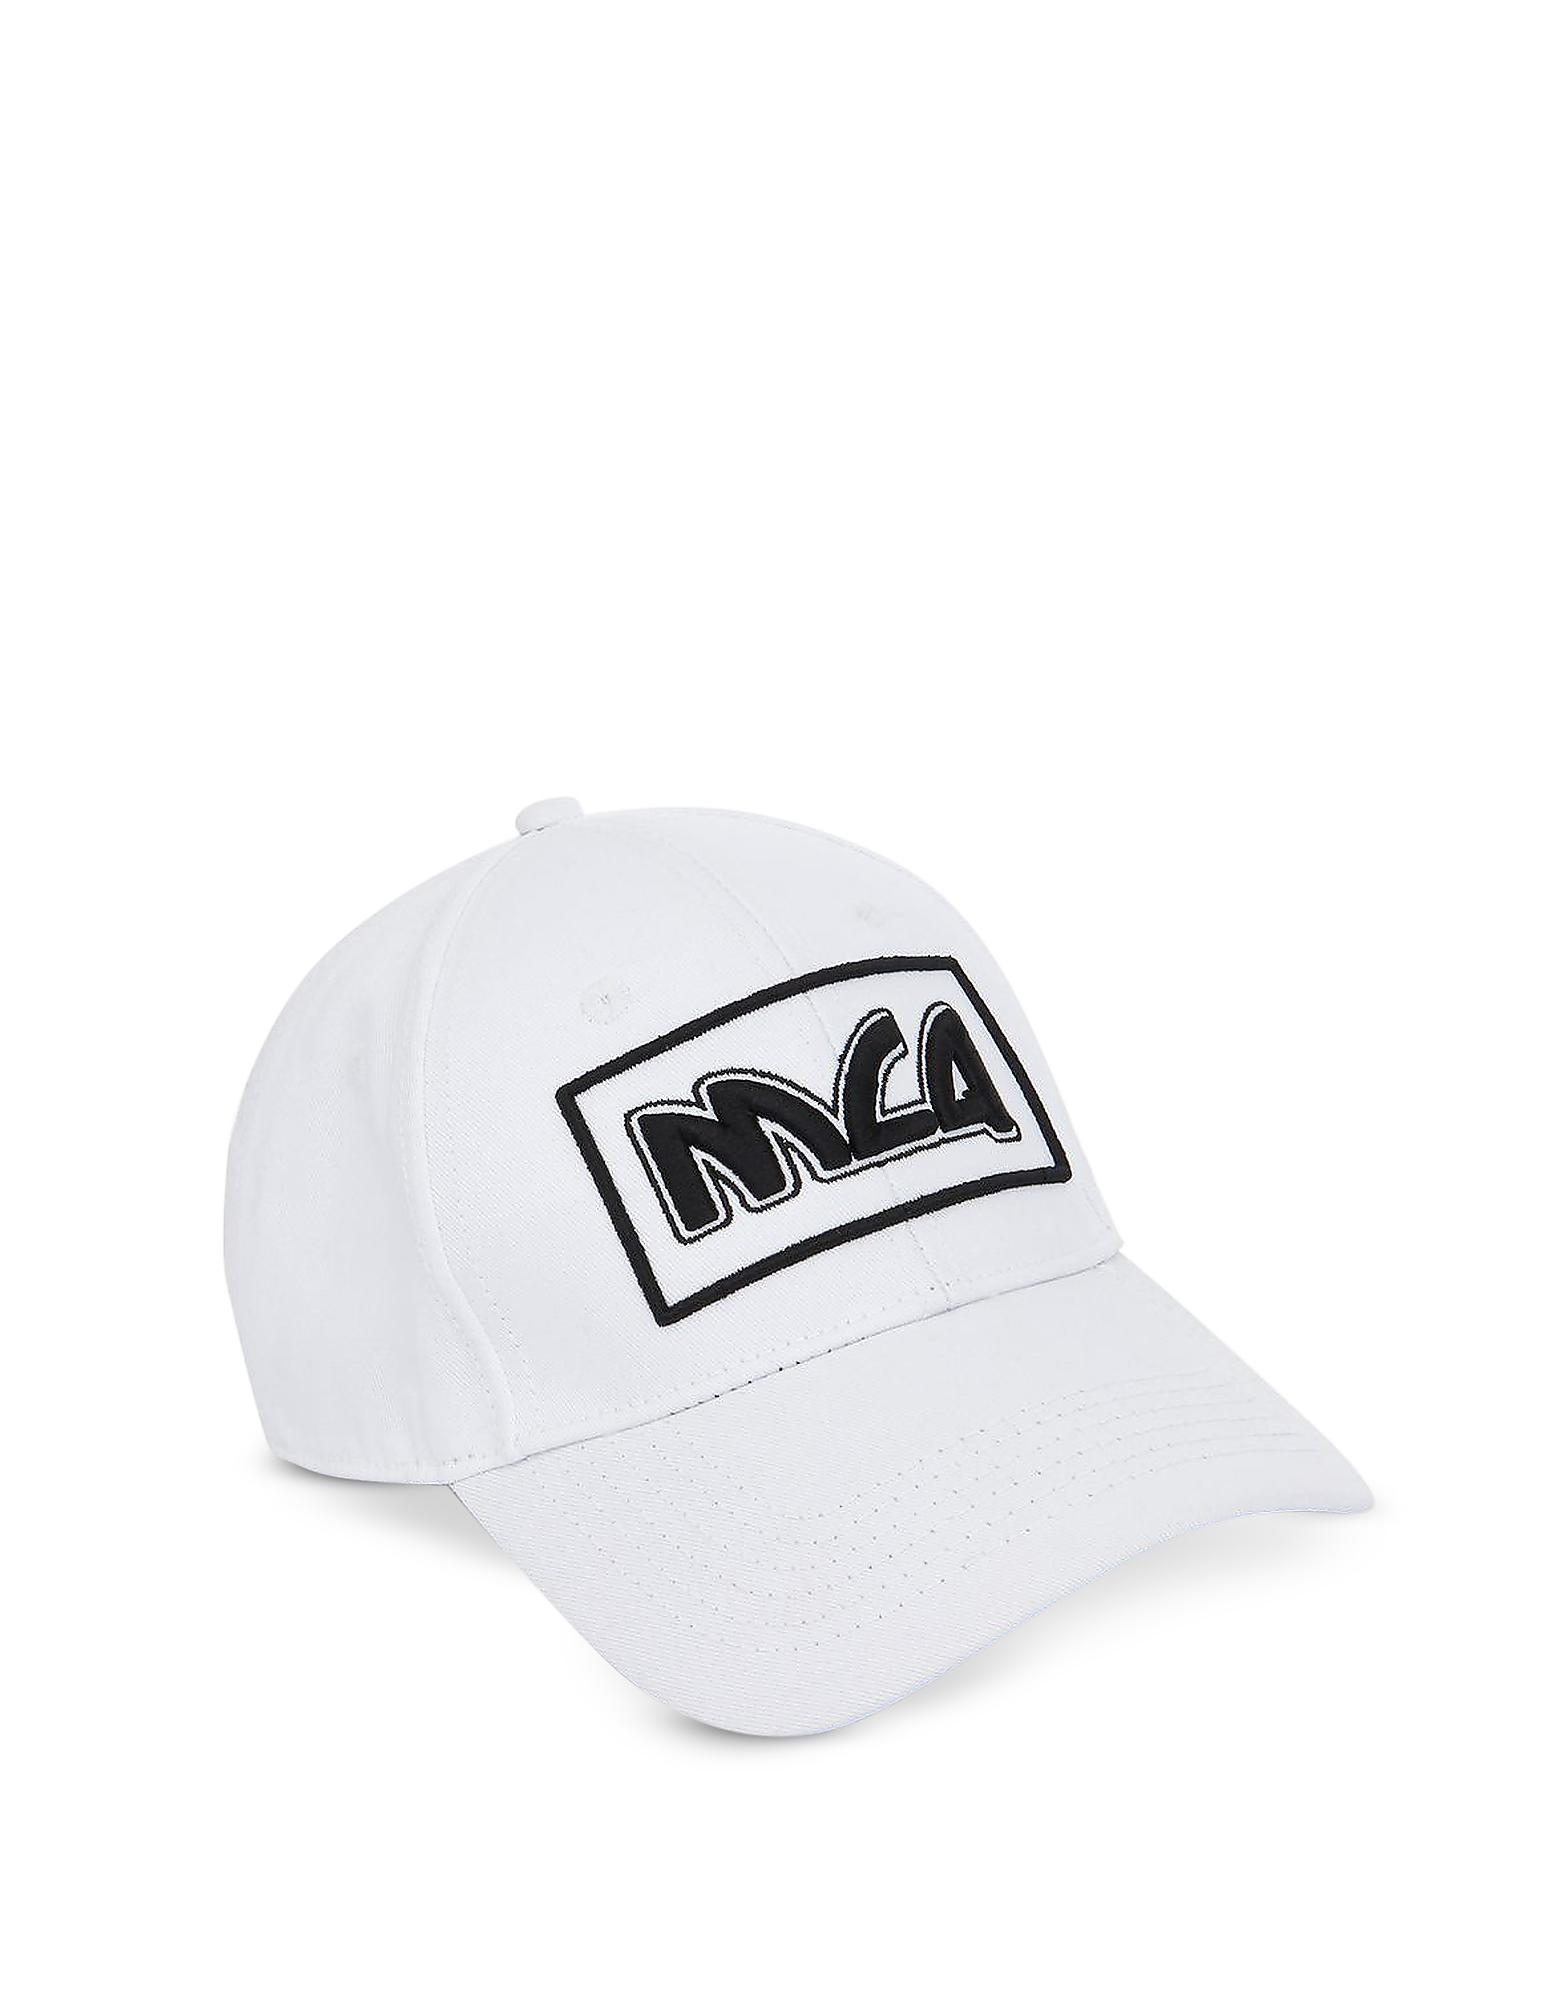 93c098280b231b Mcq By Alexander Mcqueen Mcq Alexander Mcqueen White Embroidered Metal Logo  Cap. FORZIERI